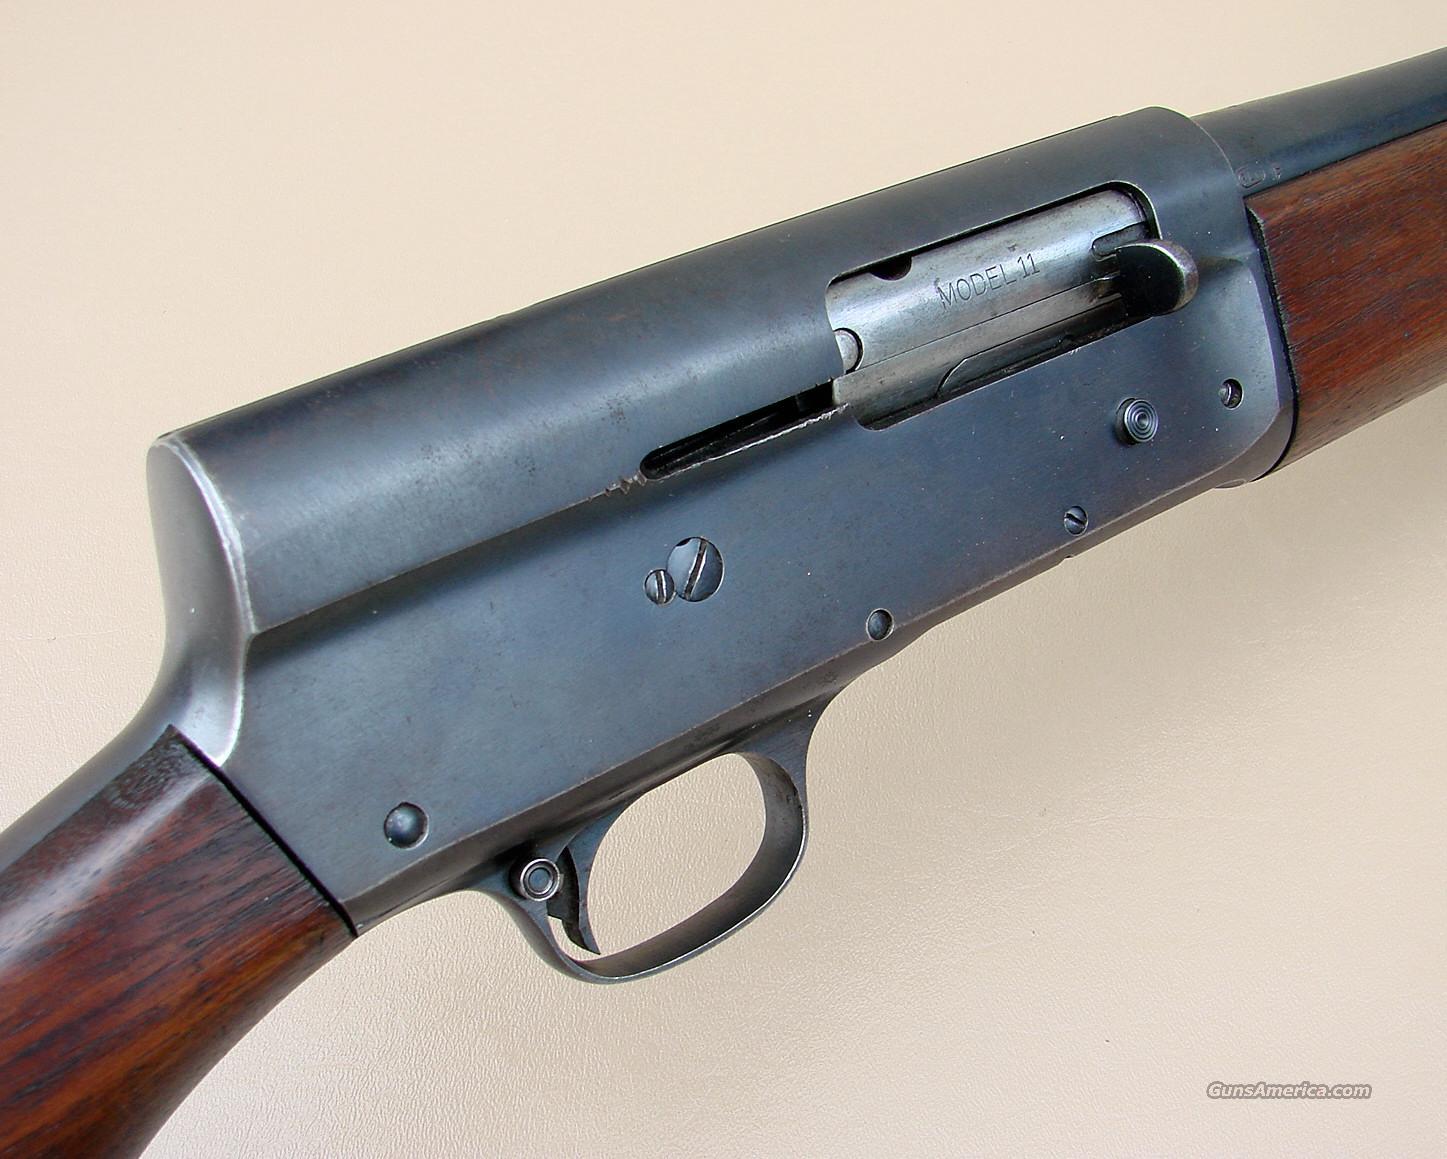 Military Guns For Sale >> Remington Model 11 US MILITARY Shotgun Used as ... for sale